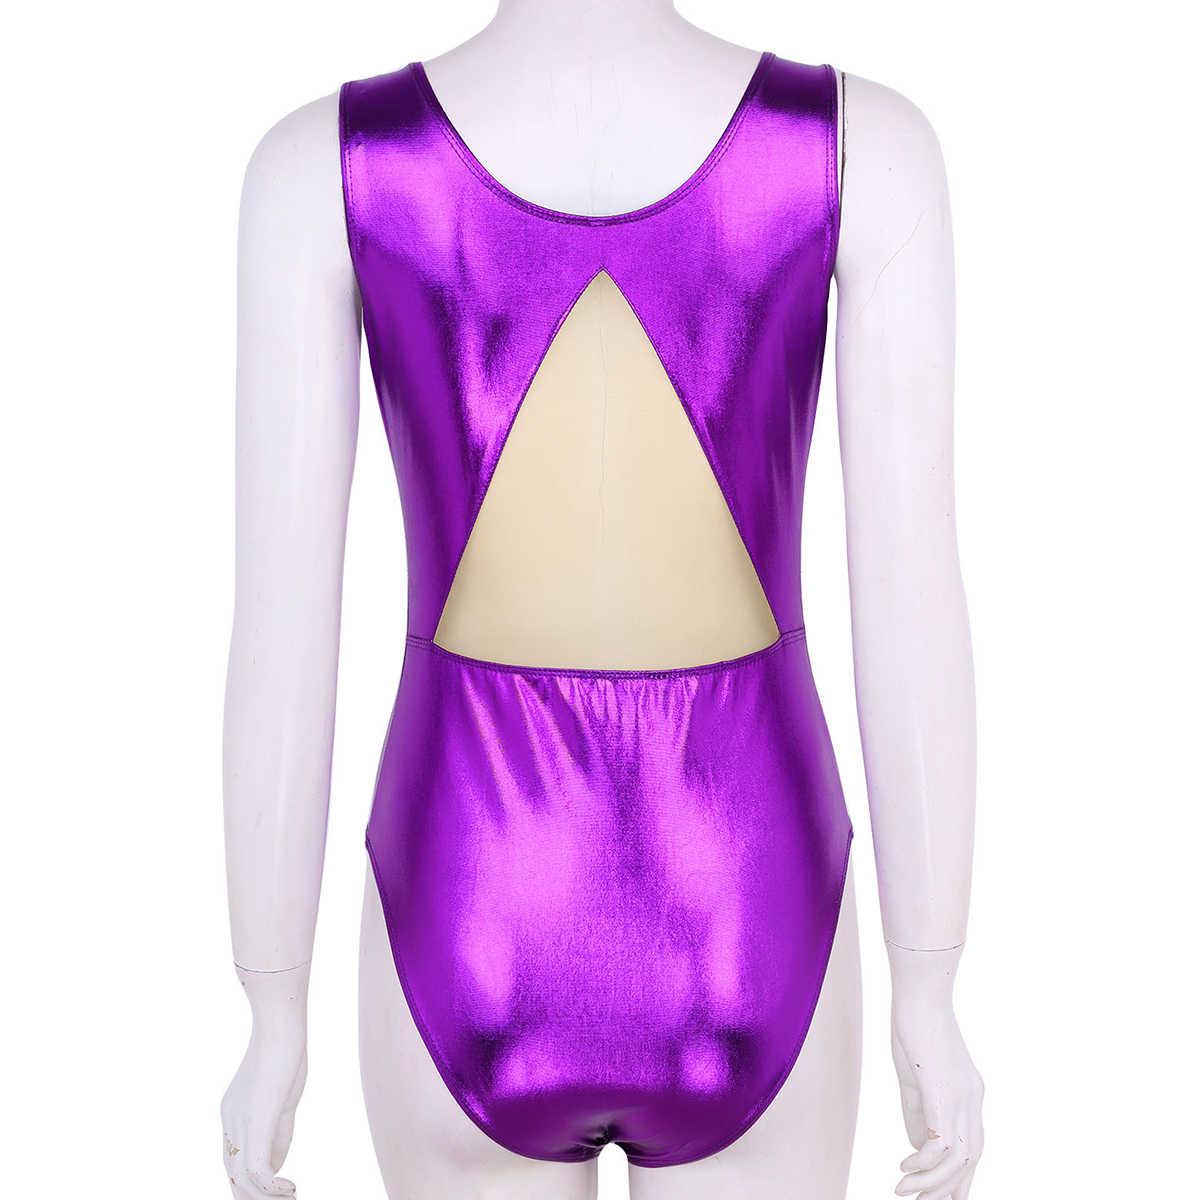 Women Adult Shiny Metallic Ballet Tutu Leotard Dance Scoop Neck Sleeveless High Cut Gymnastics Leotard Ballerina Bodysuit